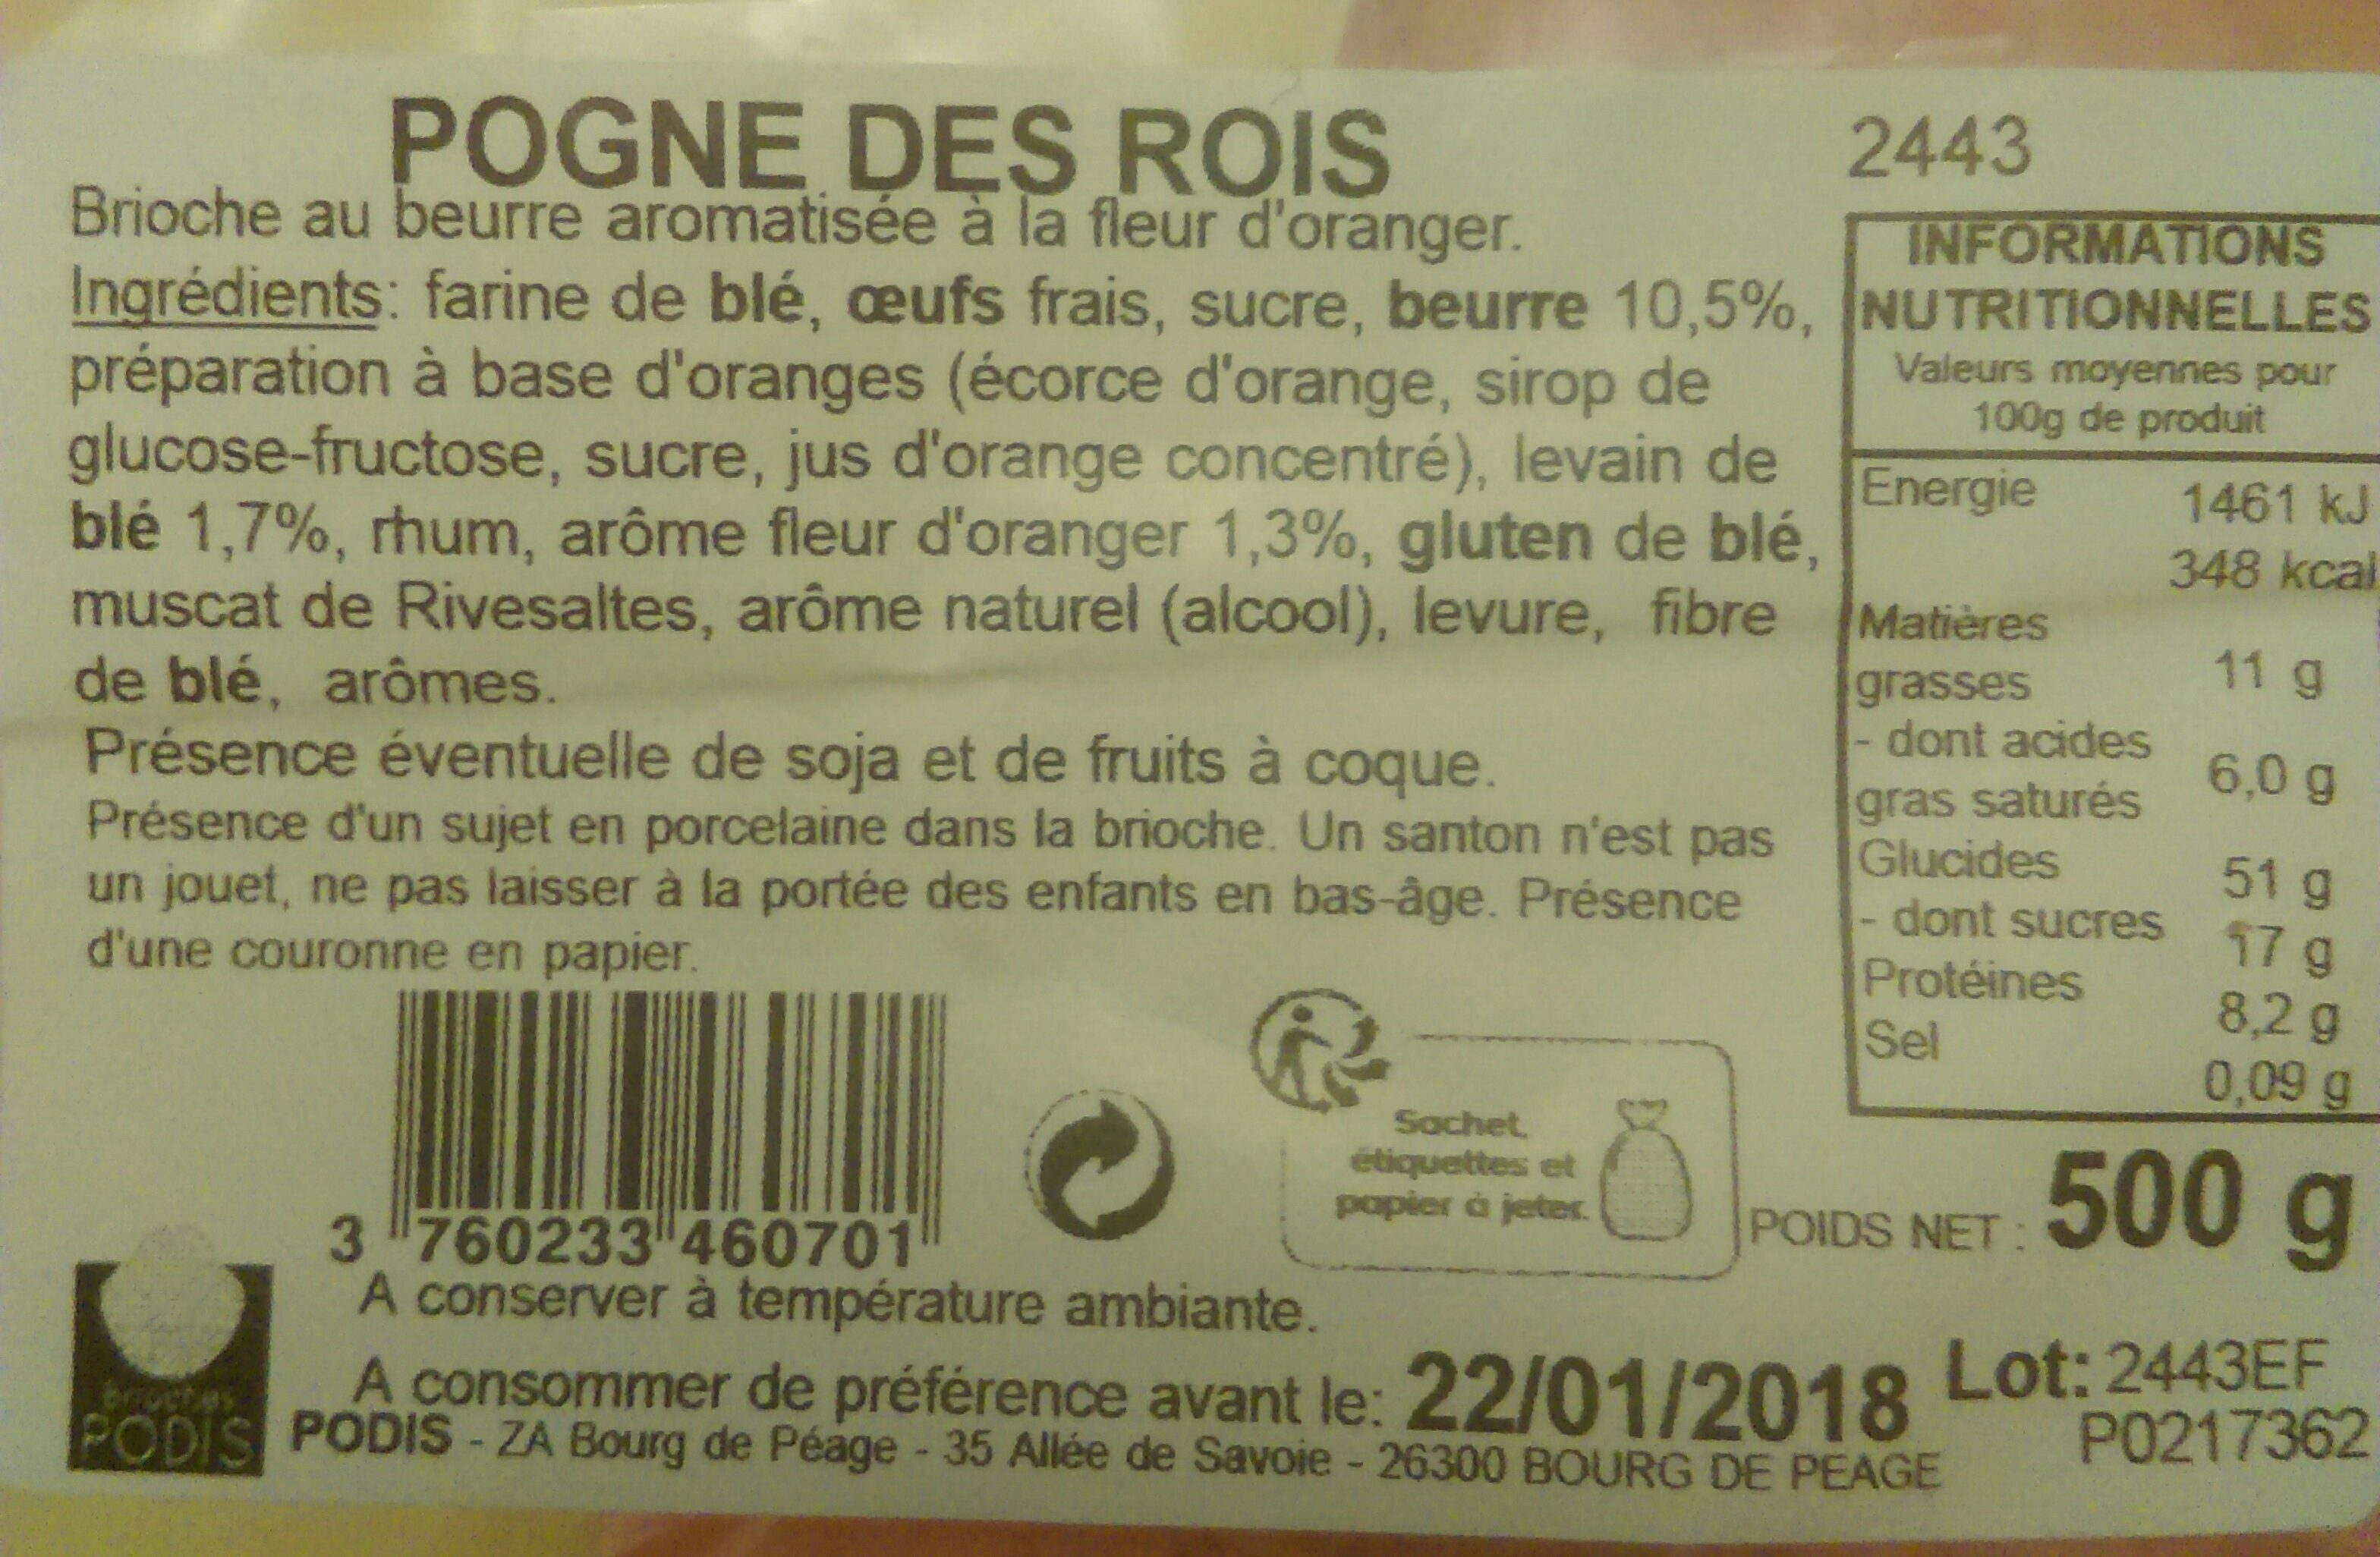 Pogne des rois - Ingrediënten